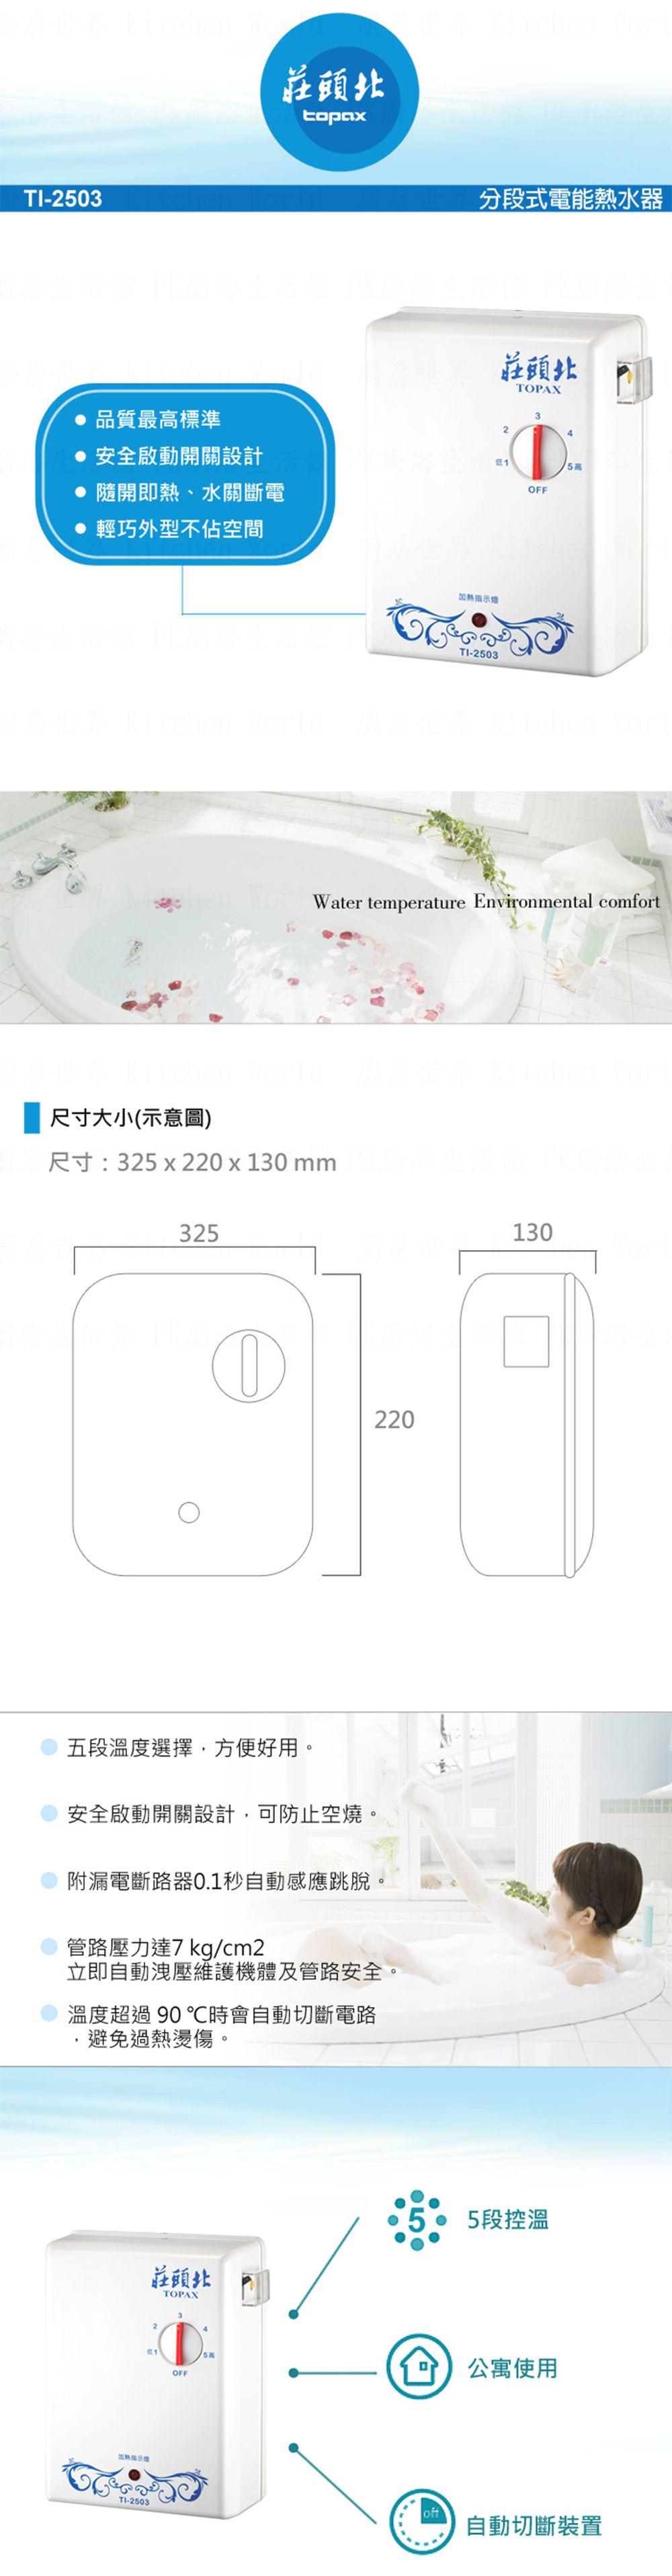 PK/goods/Topax/Water%20Heater/TI-2503-DM-1.jpg